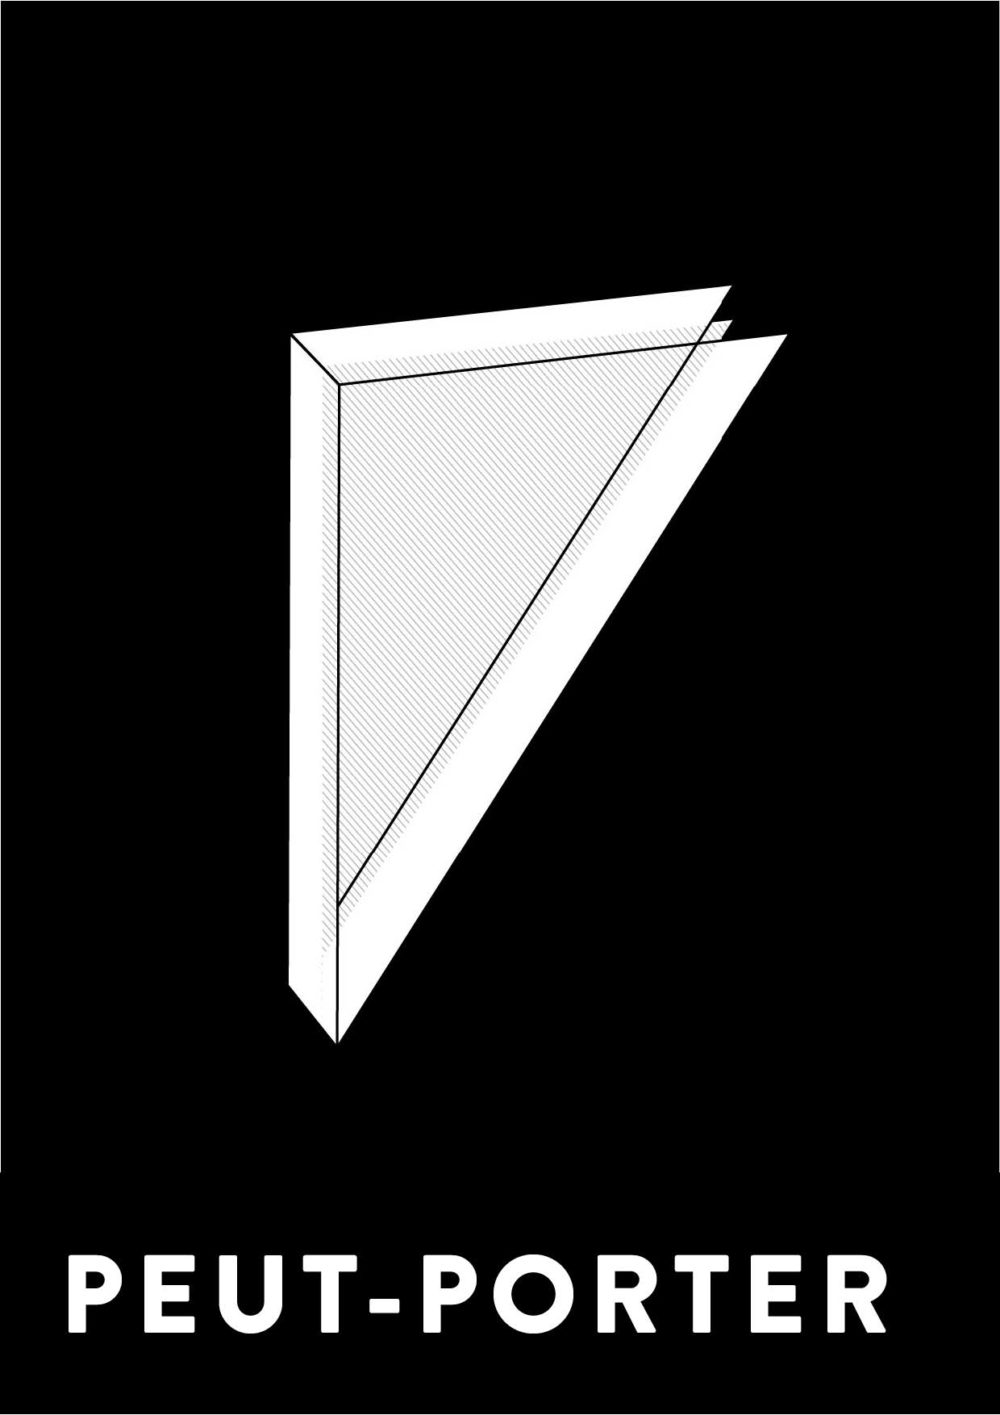 Peut-Porter Company Logo